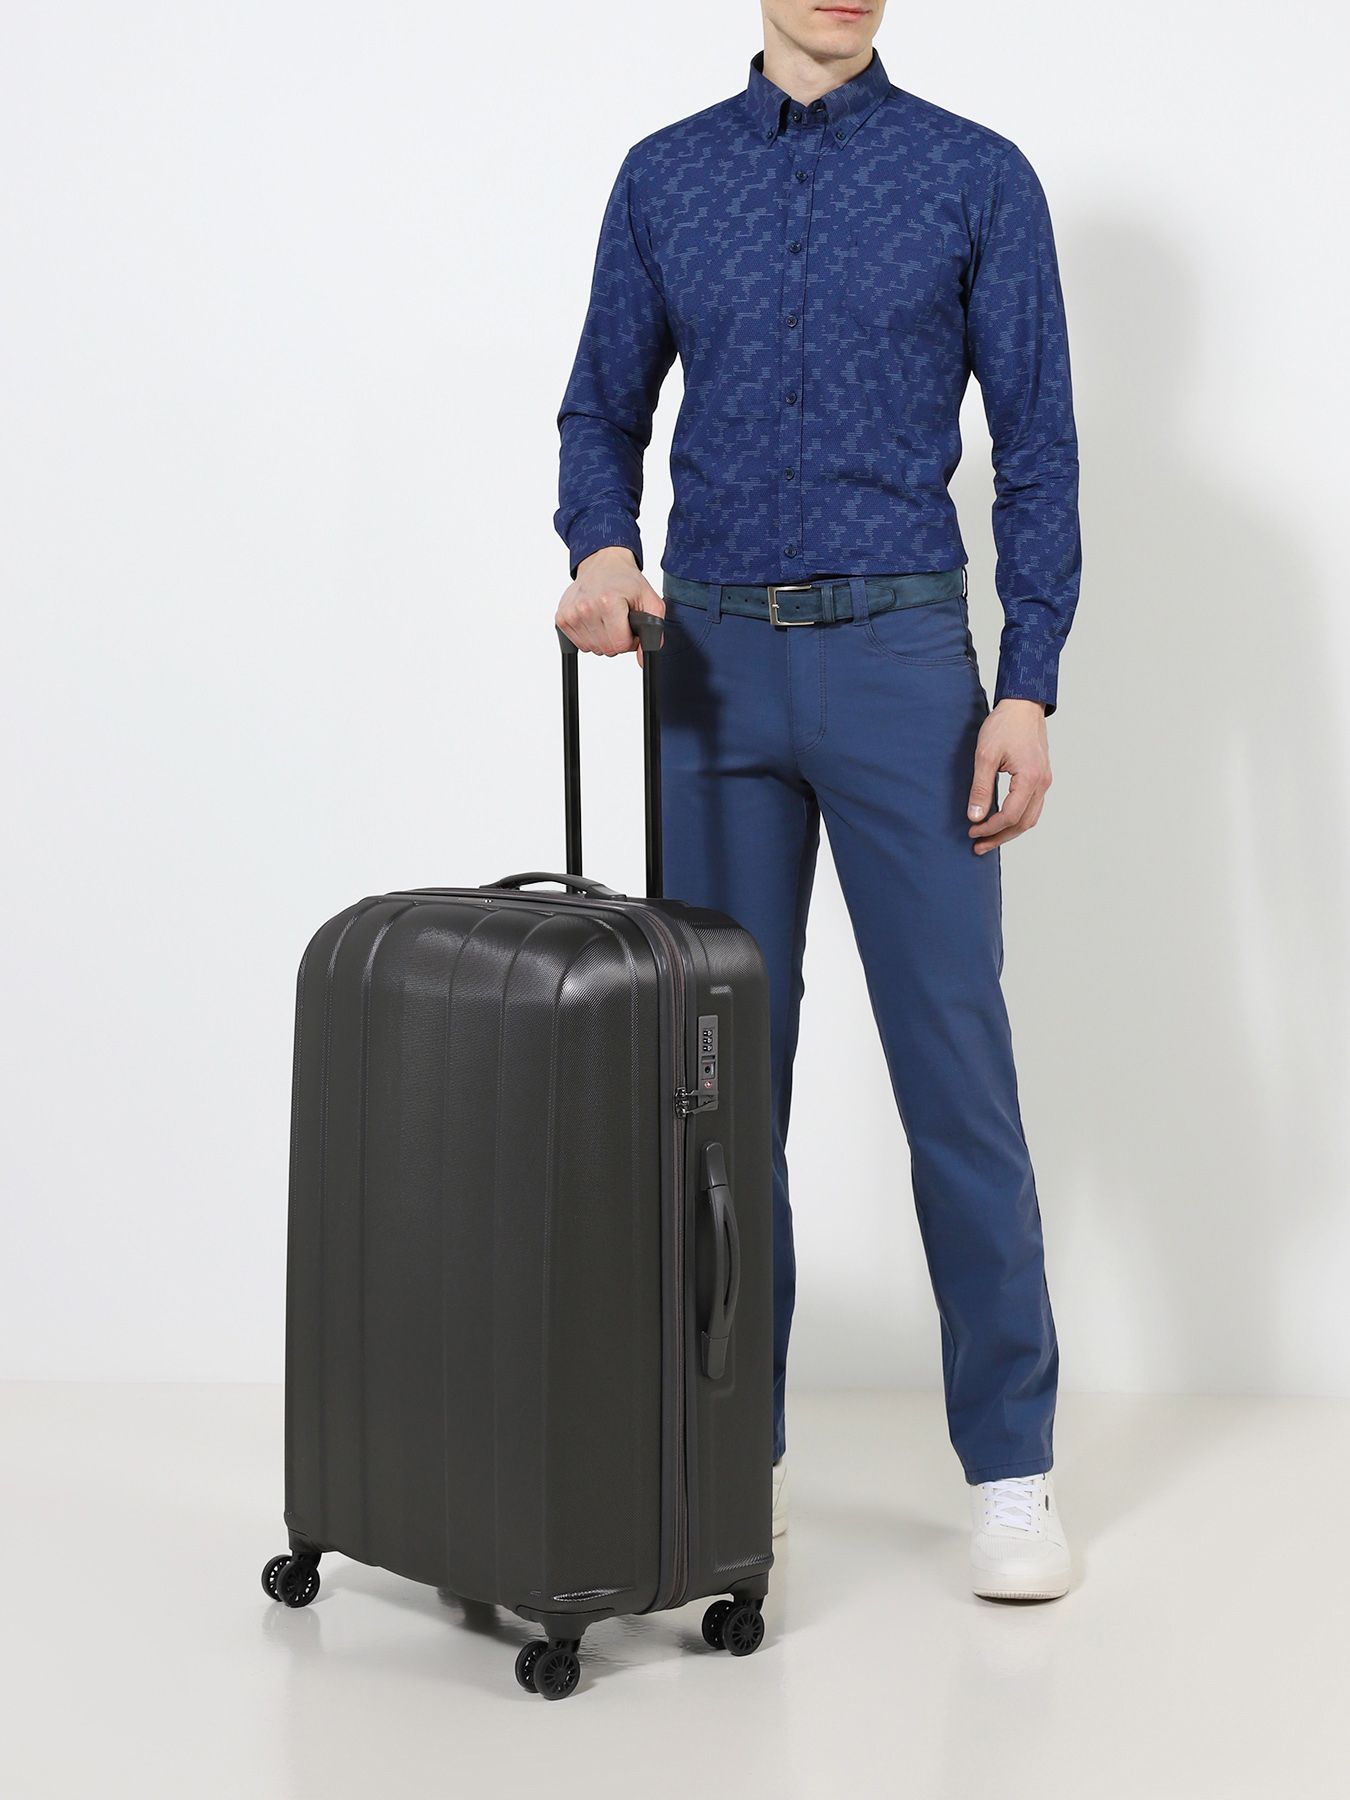 Чемодан Ritter Чемодан RR 28 чемодан ritter чемодан rc 20